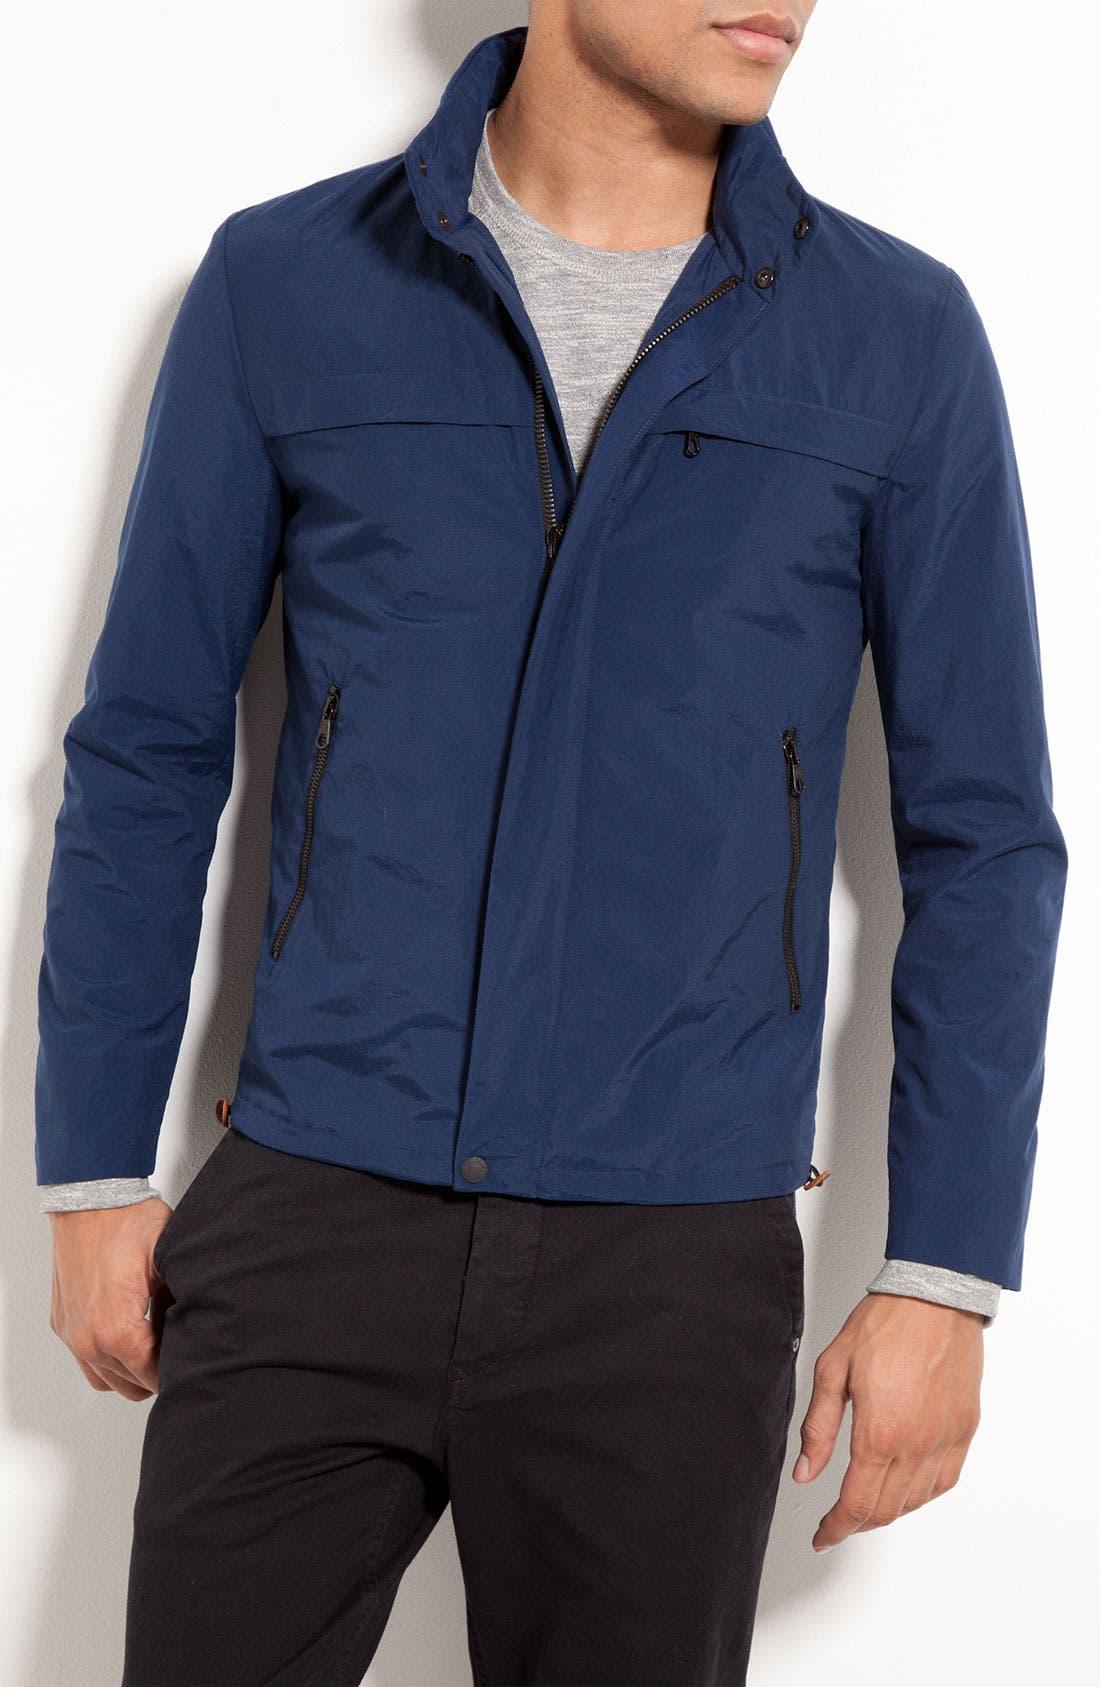 RAG & BONE 'Yorke' Jacket, Main, color, 402